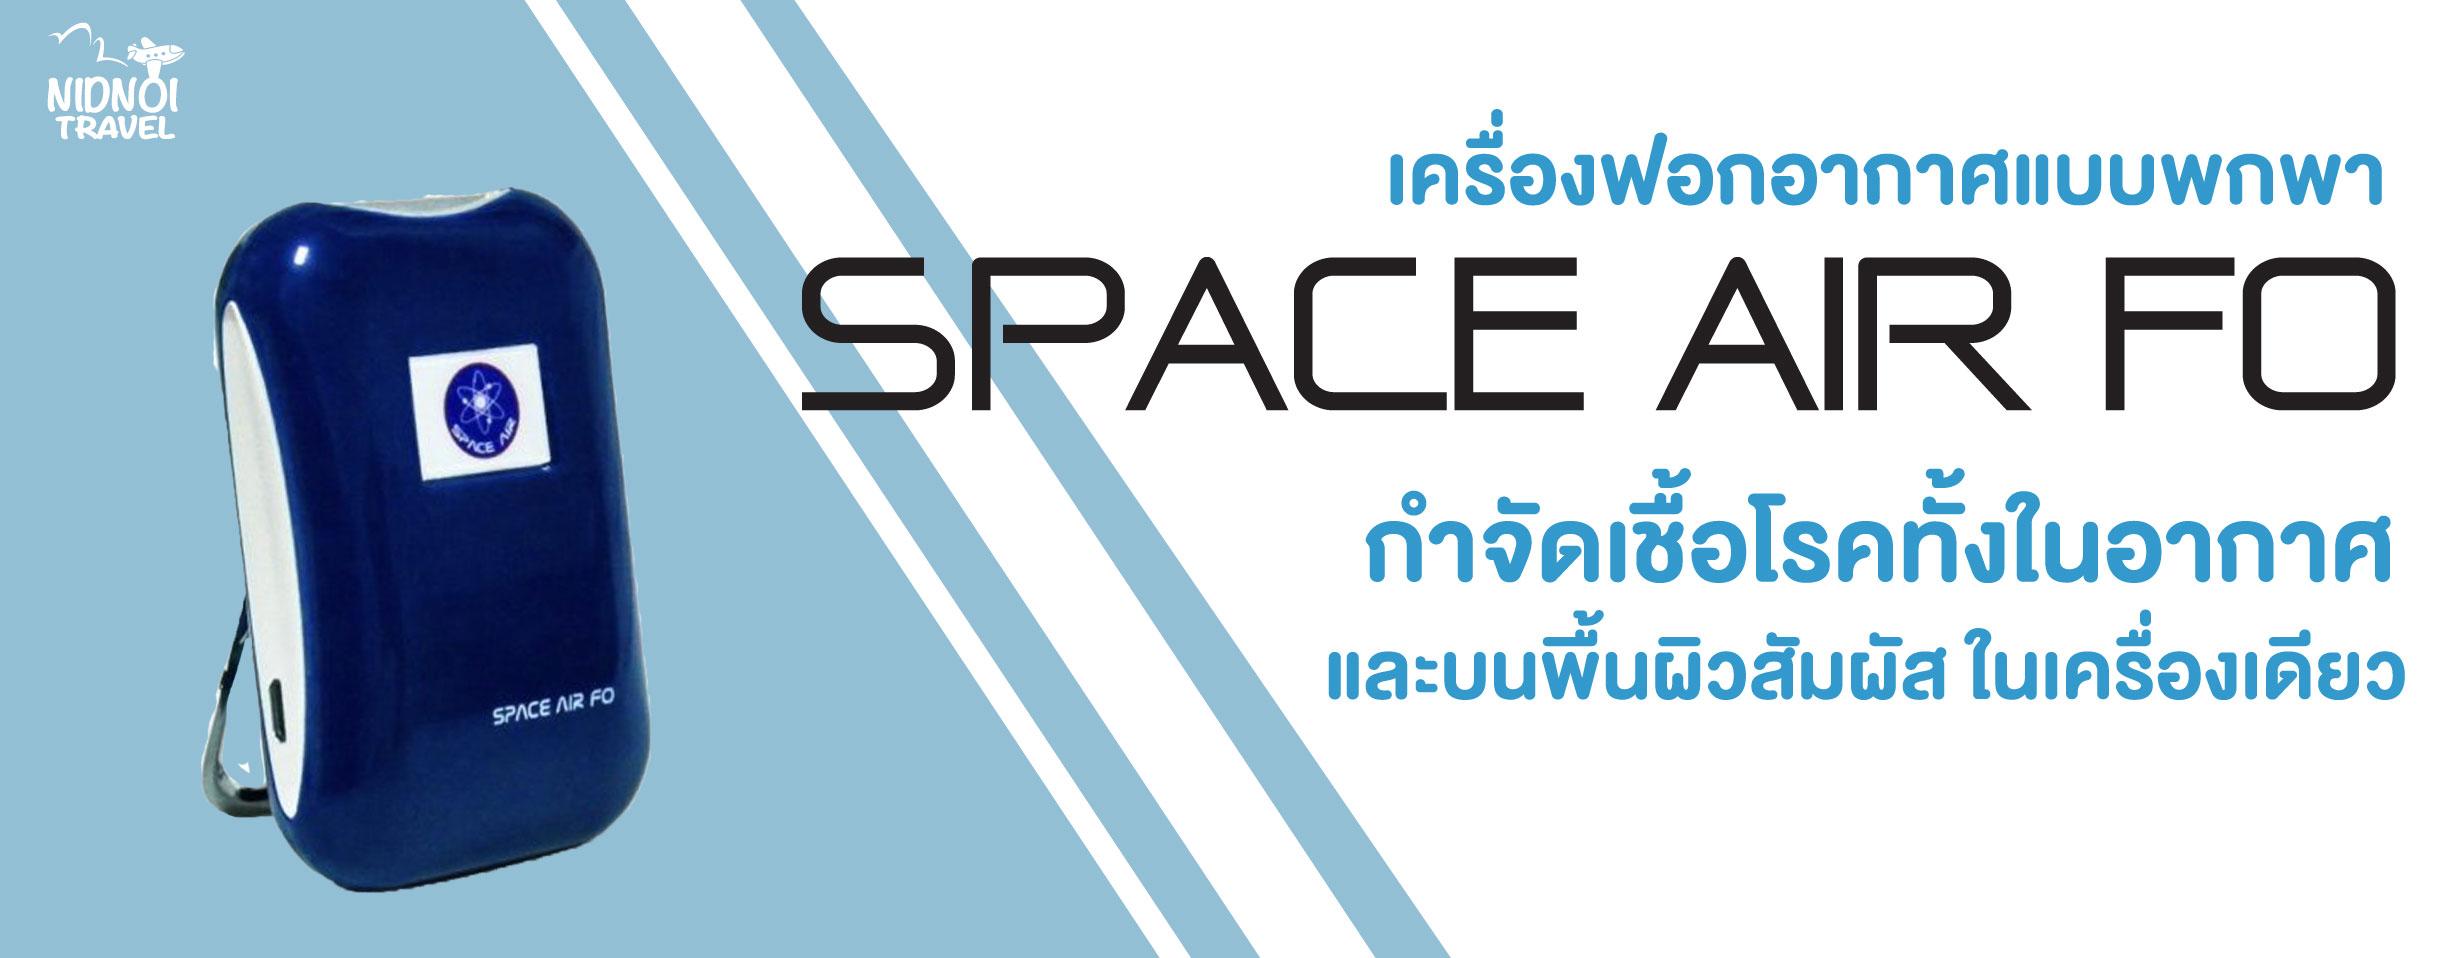 SPACE AIR FO เครื่องฟอกอากาศแบบพกพา สเปซแอร์